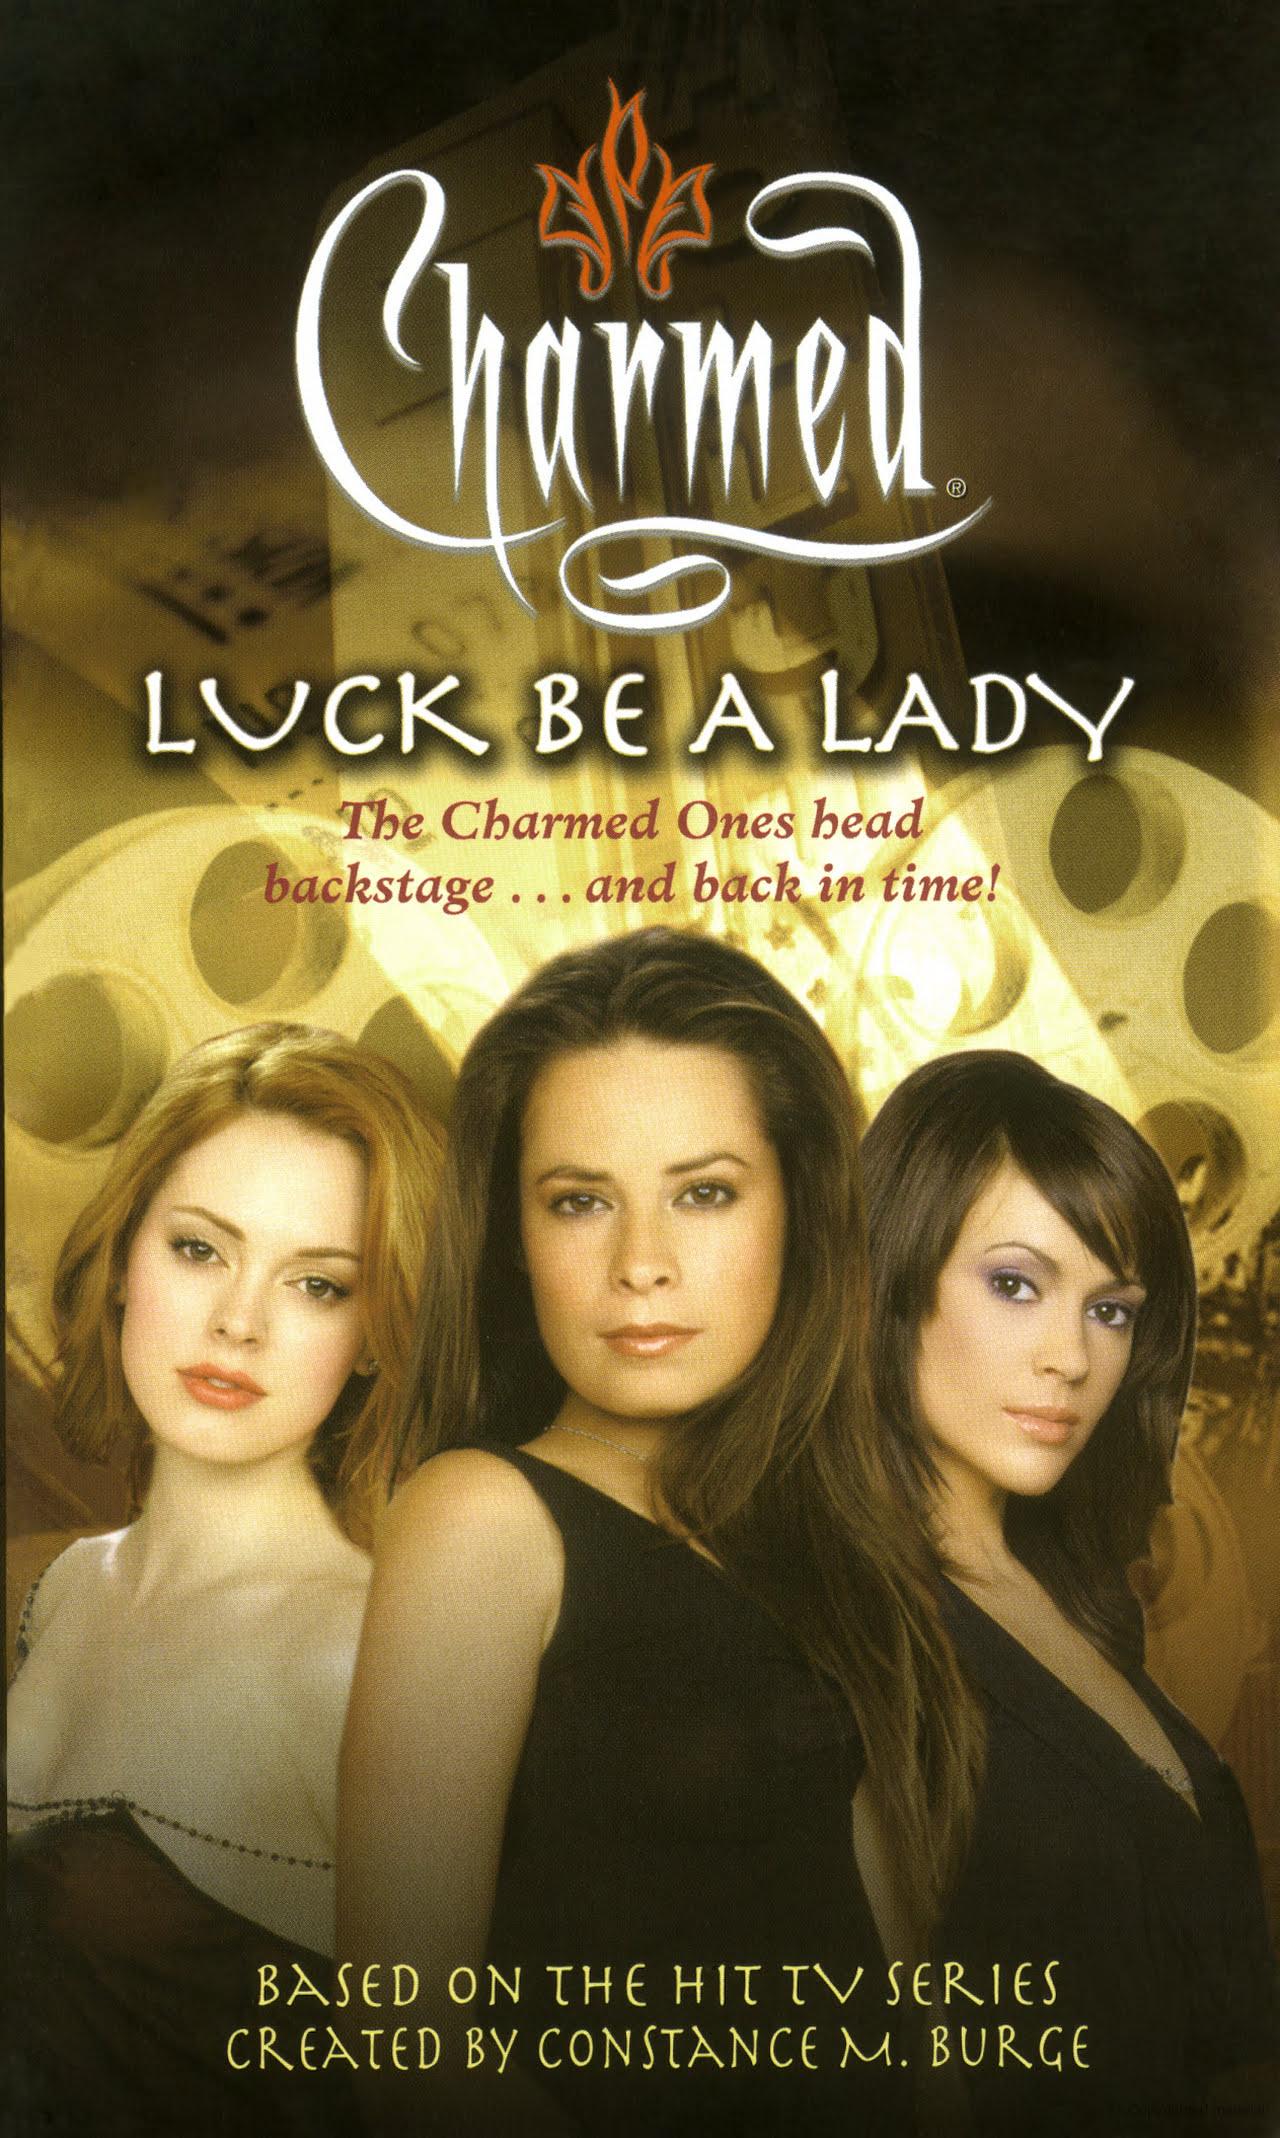 Charmed Books